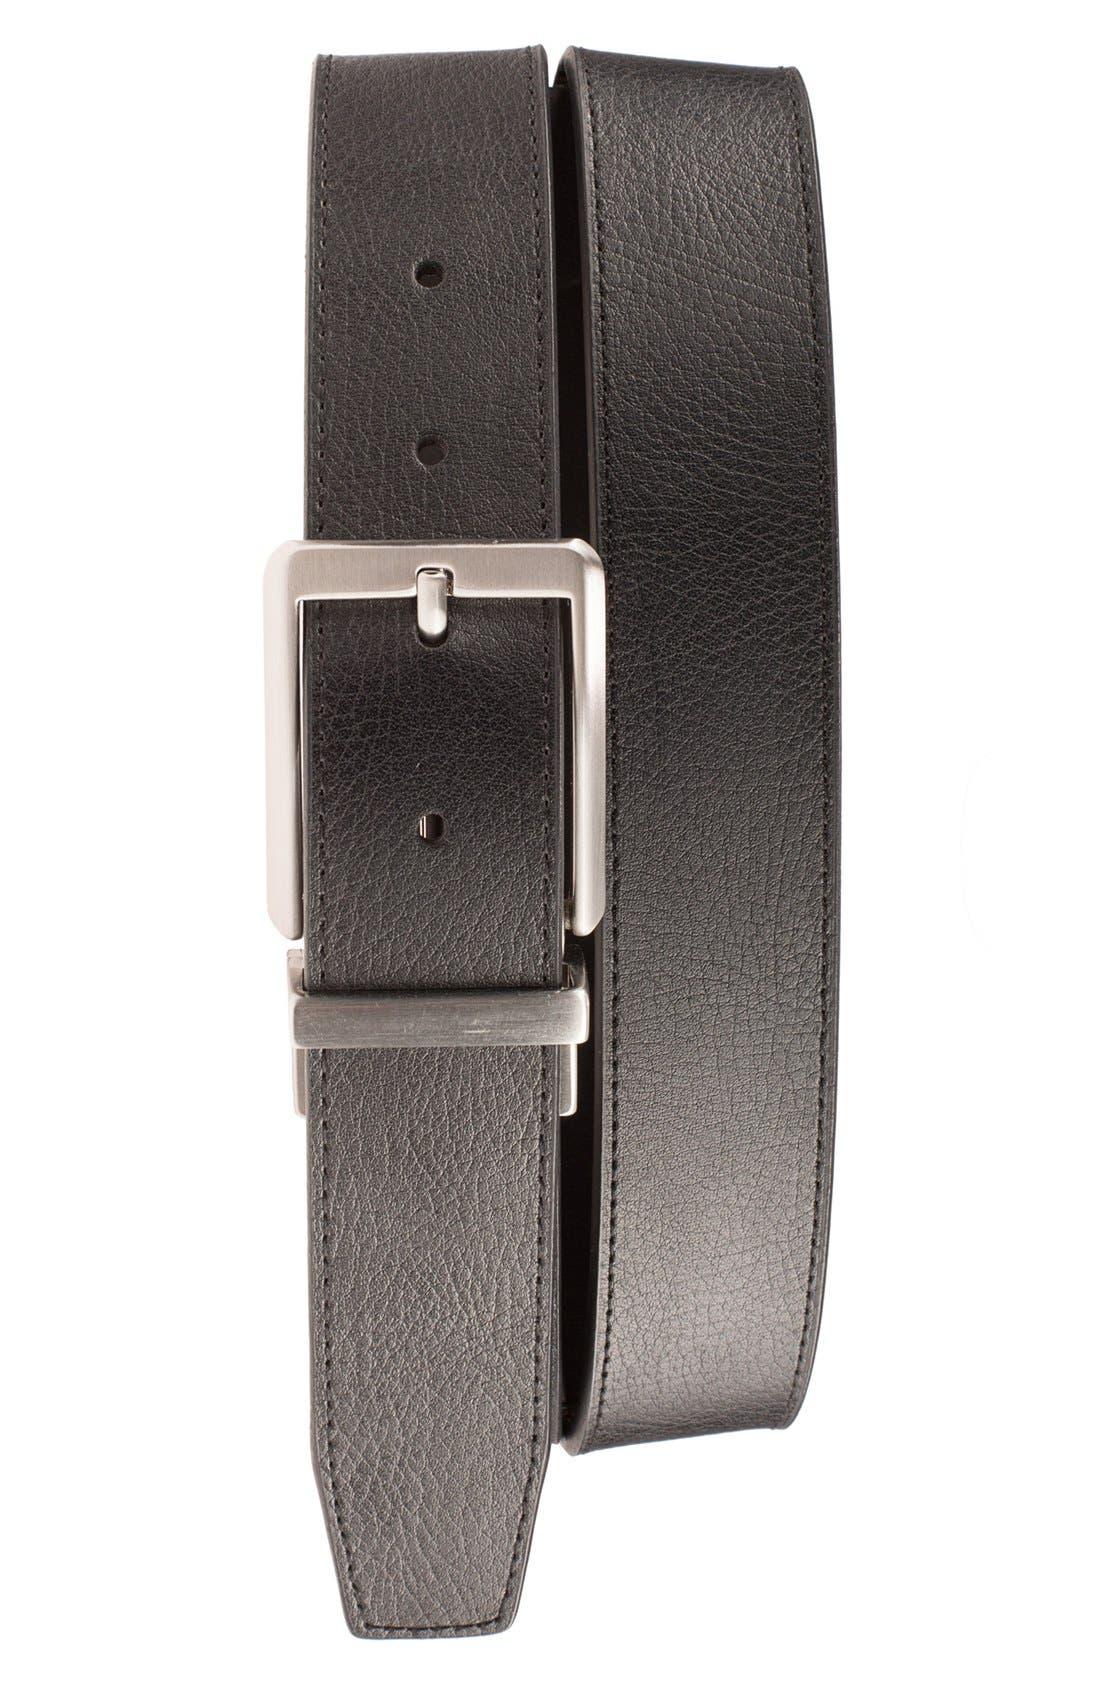 NIKE, 'Core' Reversible Leather Belt, Main thumbnail 1, color, BLACK/ BROWN